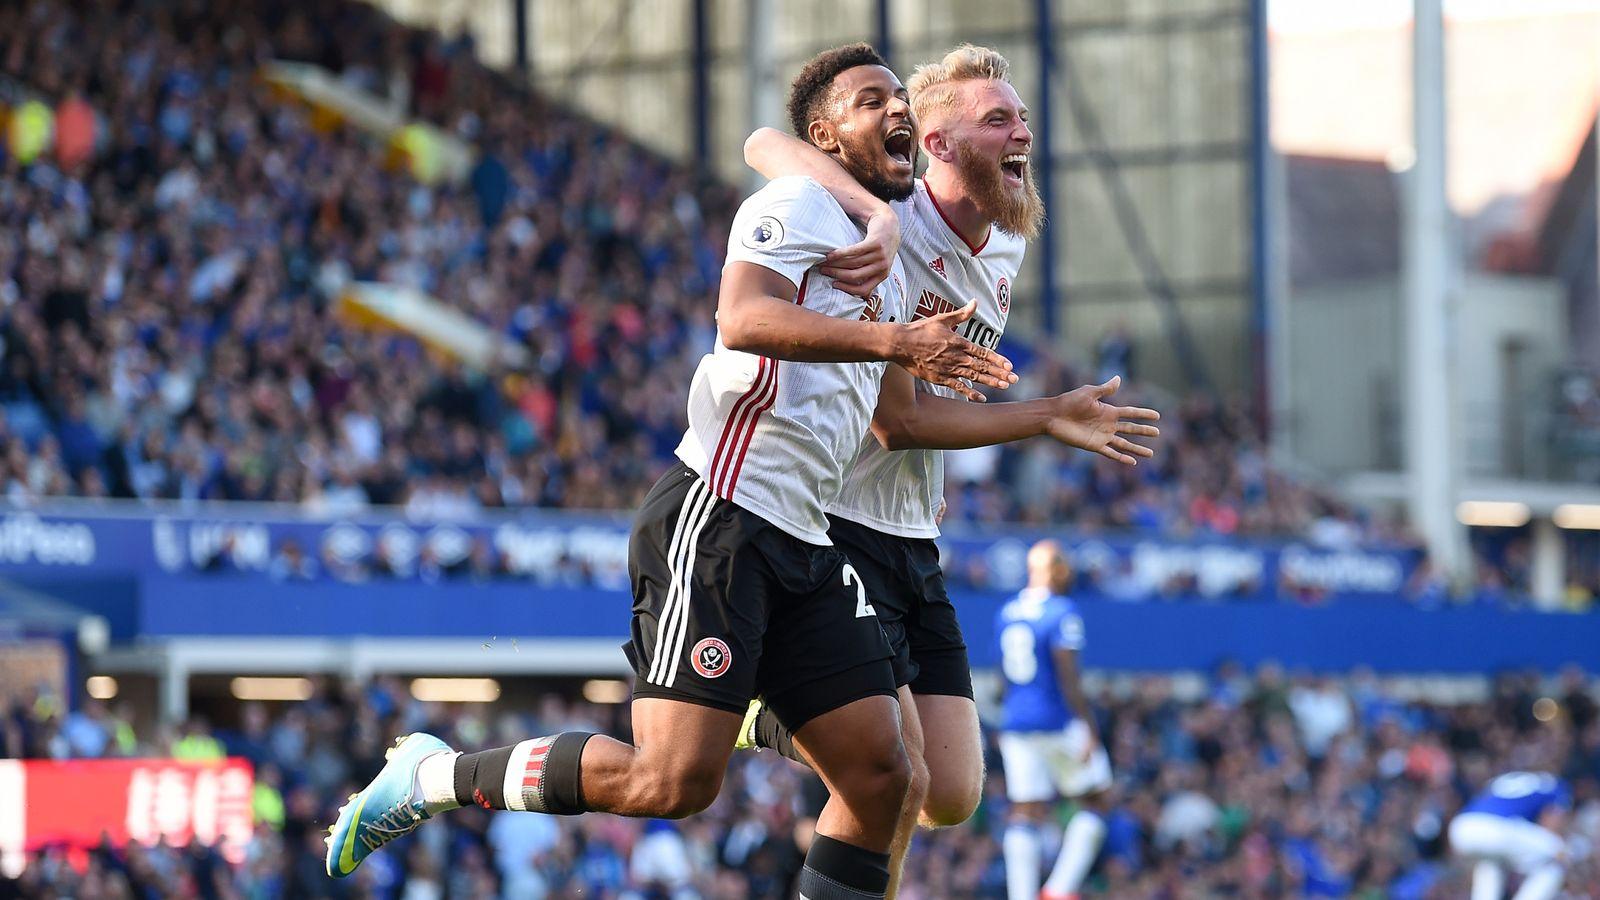 Match Report - Everton 0 - 2 Sheff Utd   21 Sep 2019